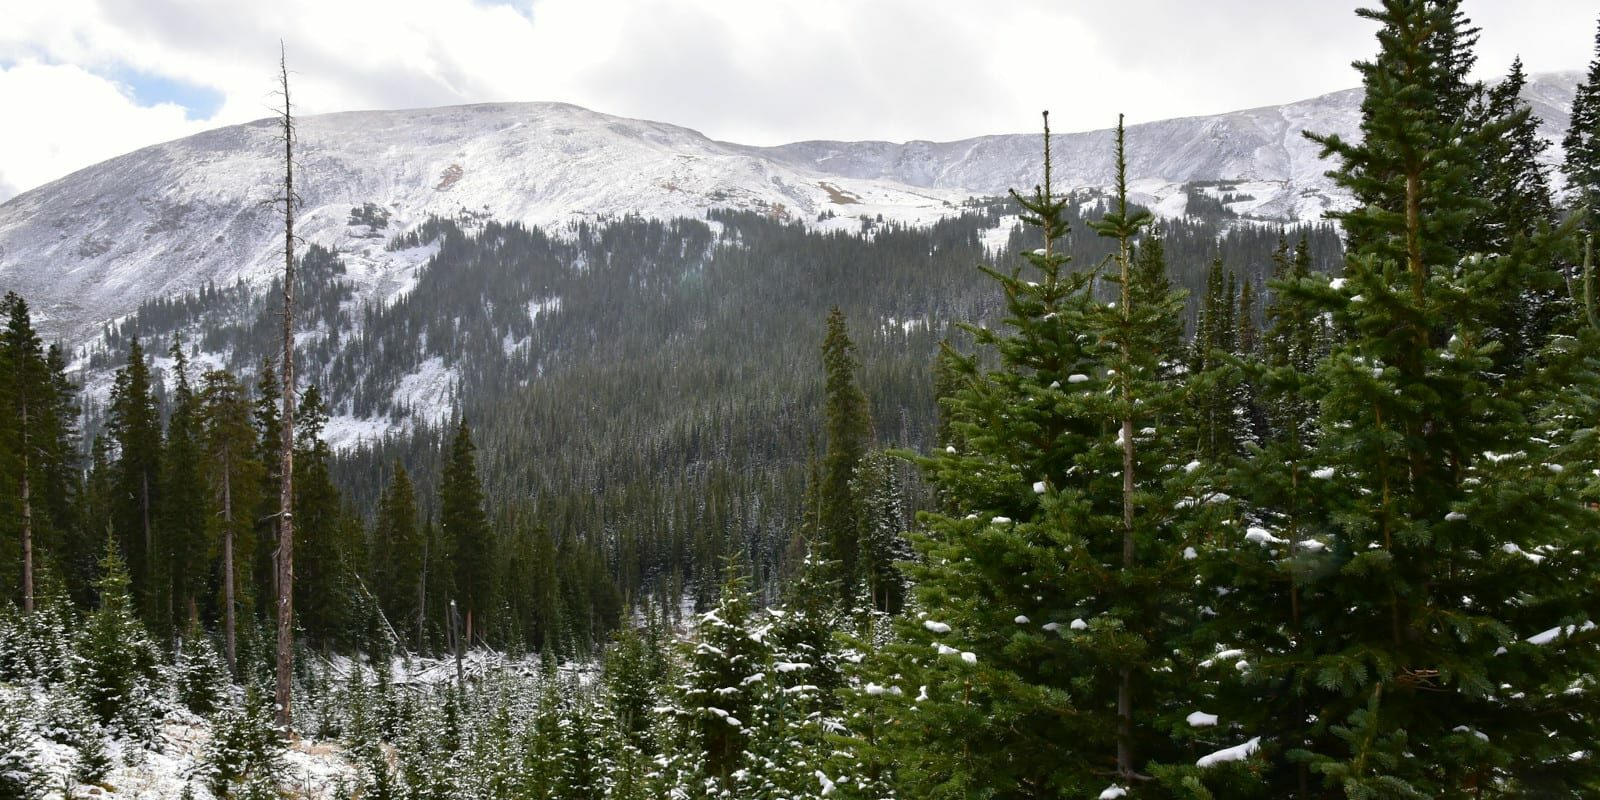 Image of the road to Geneva City, Colorado